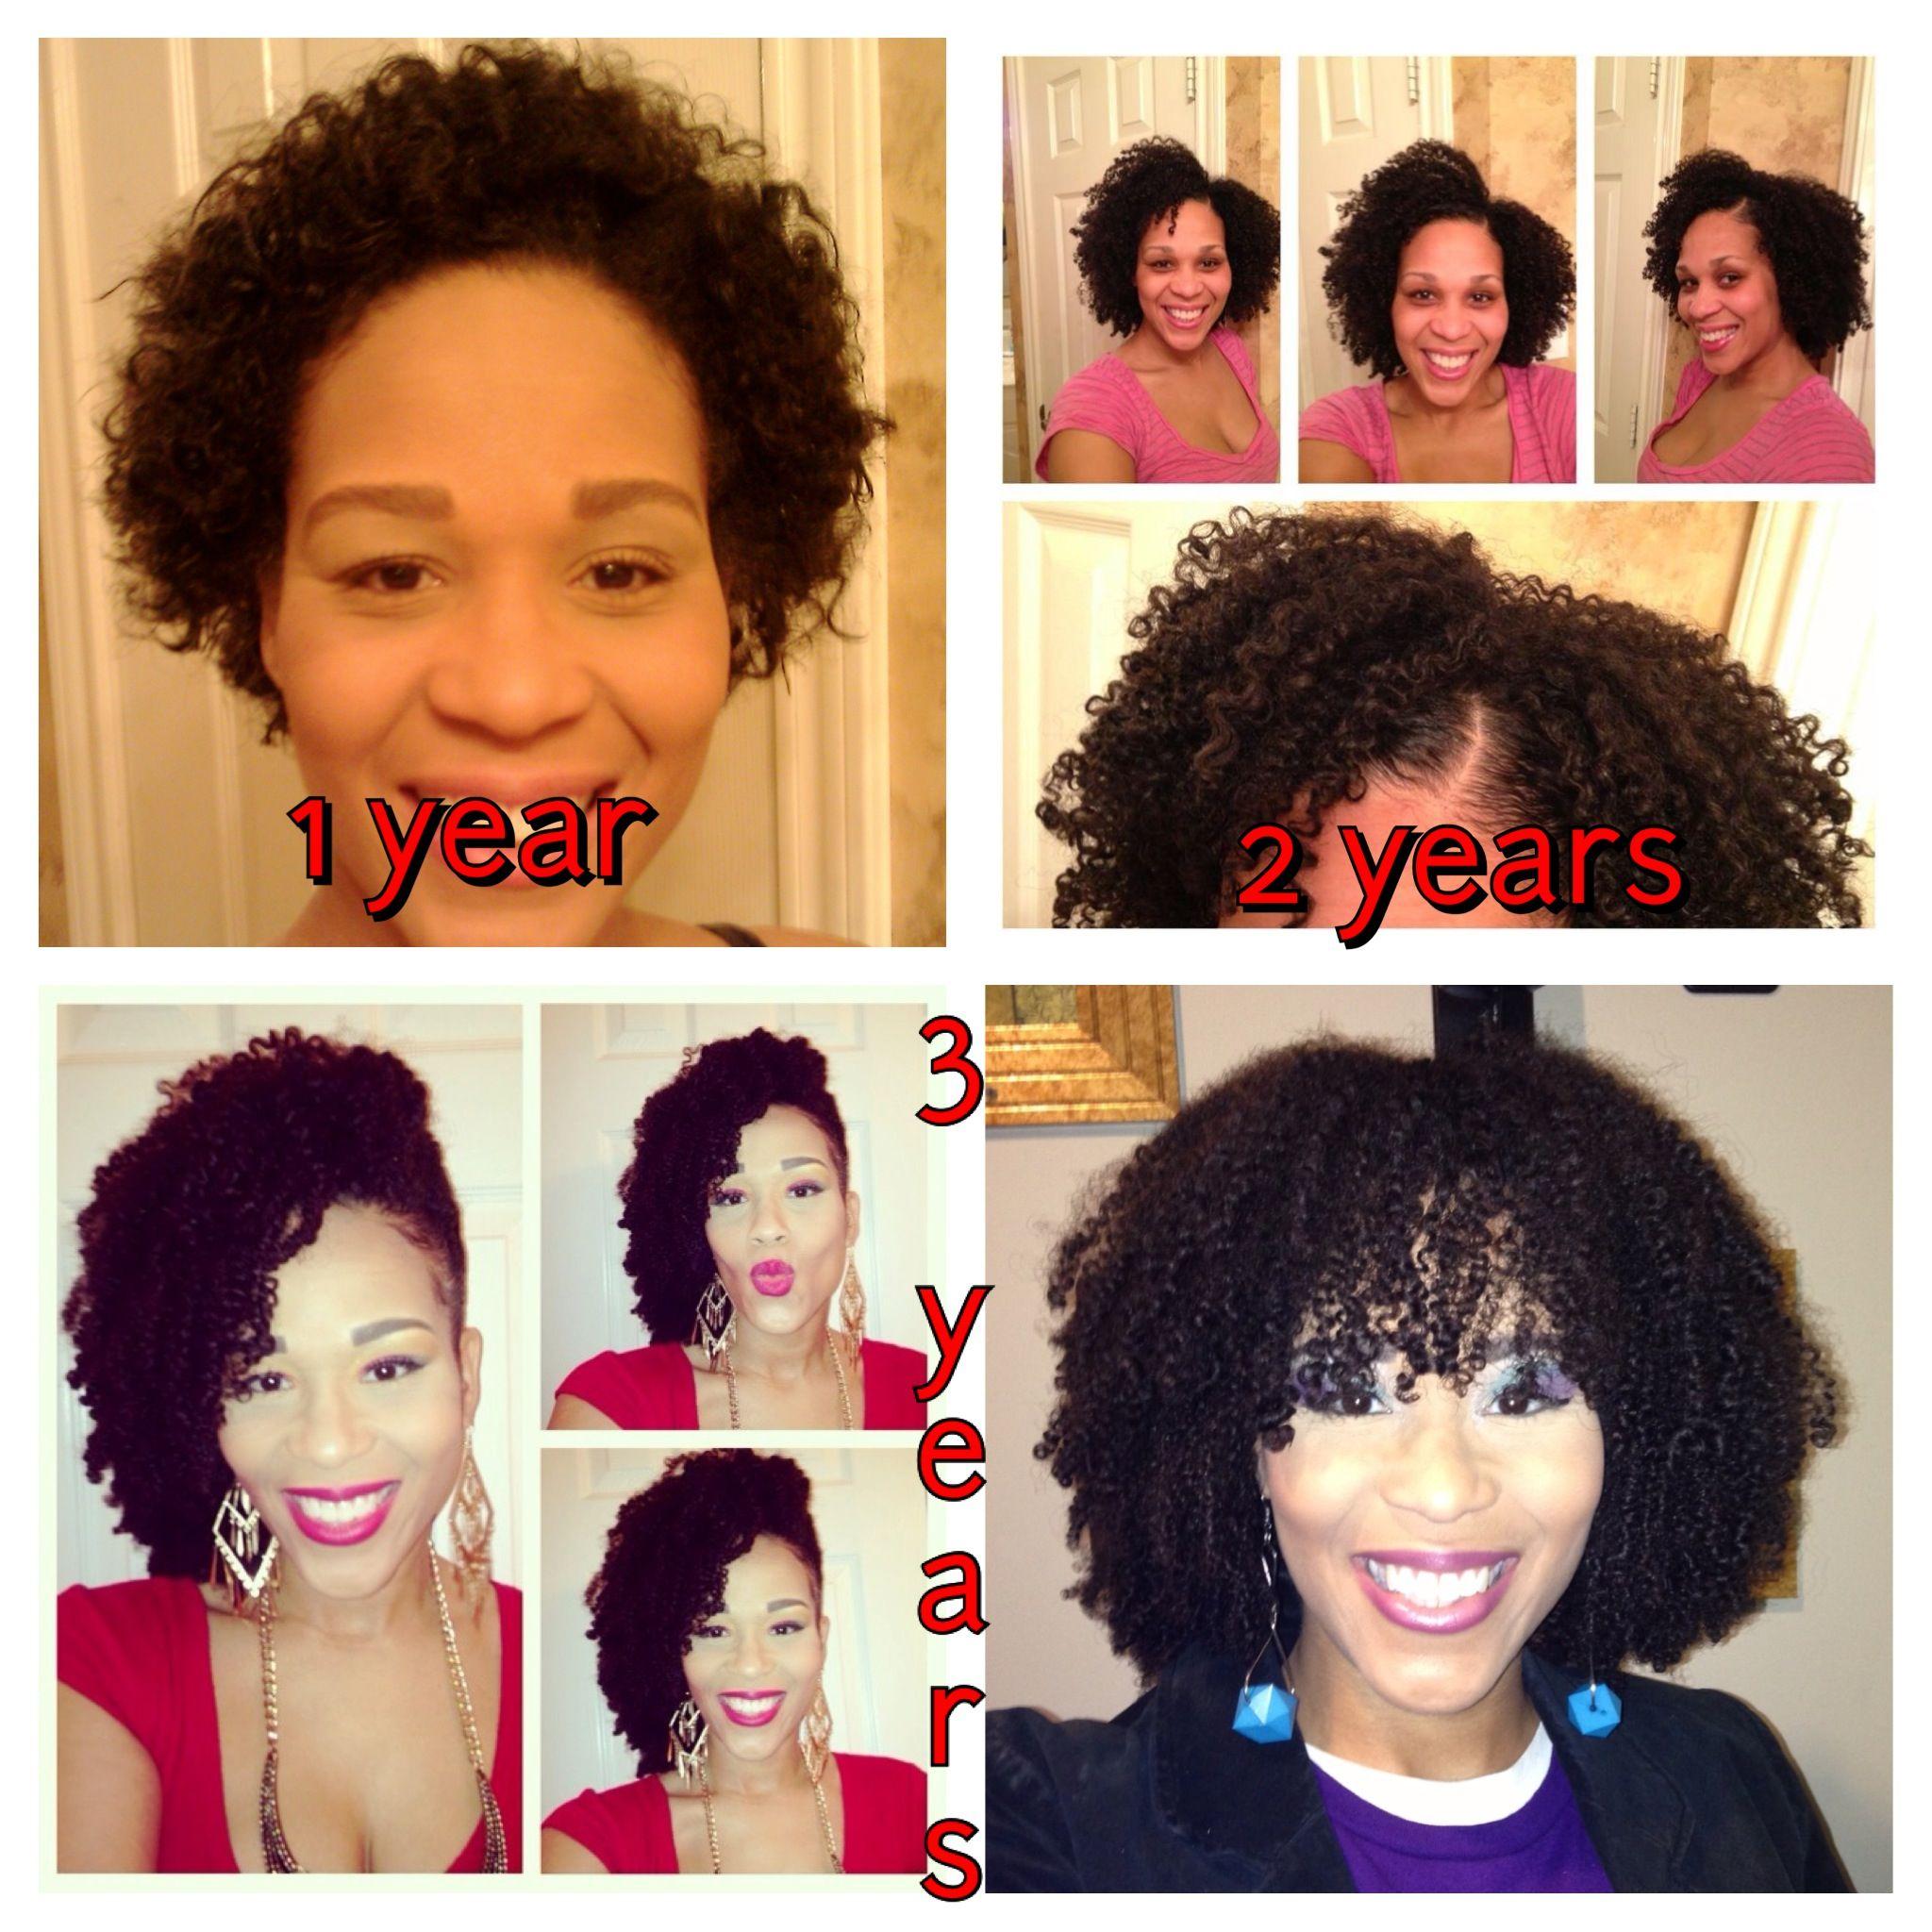 3 years natural hair growth